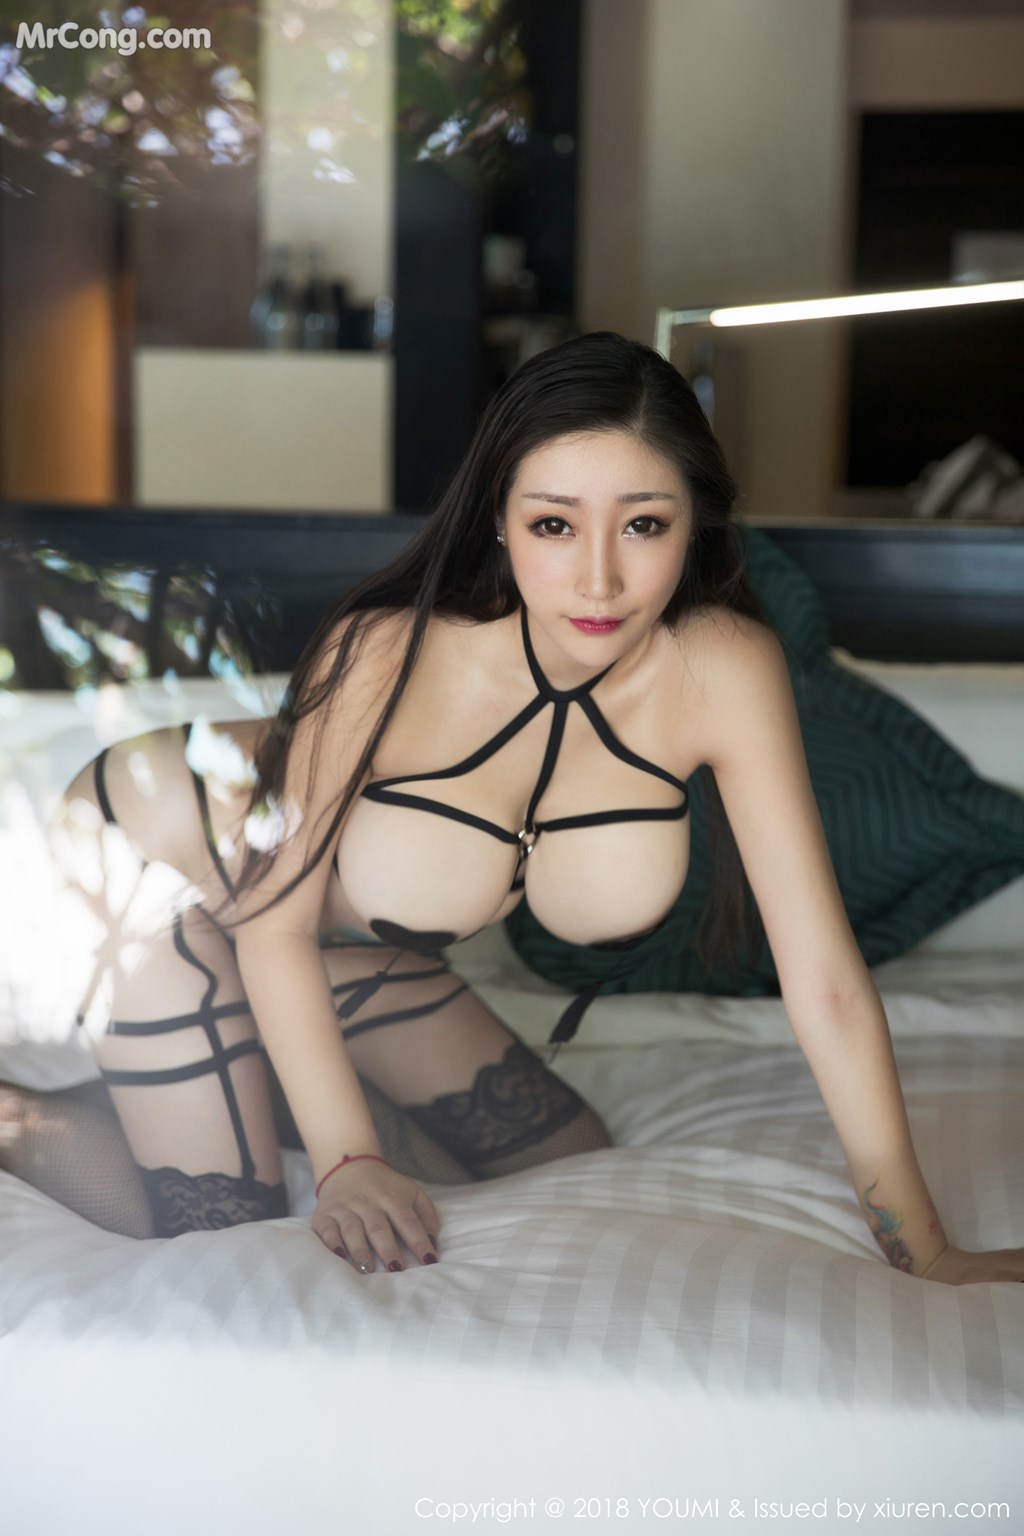 Image YouMi-Vol.221-Daji-Toxic-MrCong.com-003 in post YouMi Vol.221: Người mẫu Daji_Toxic (妲己_Toxic) (45 ảnh)